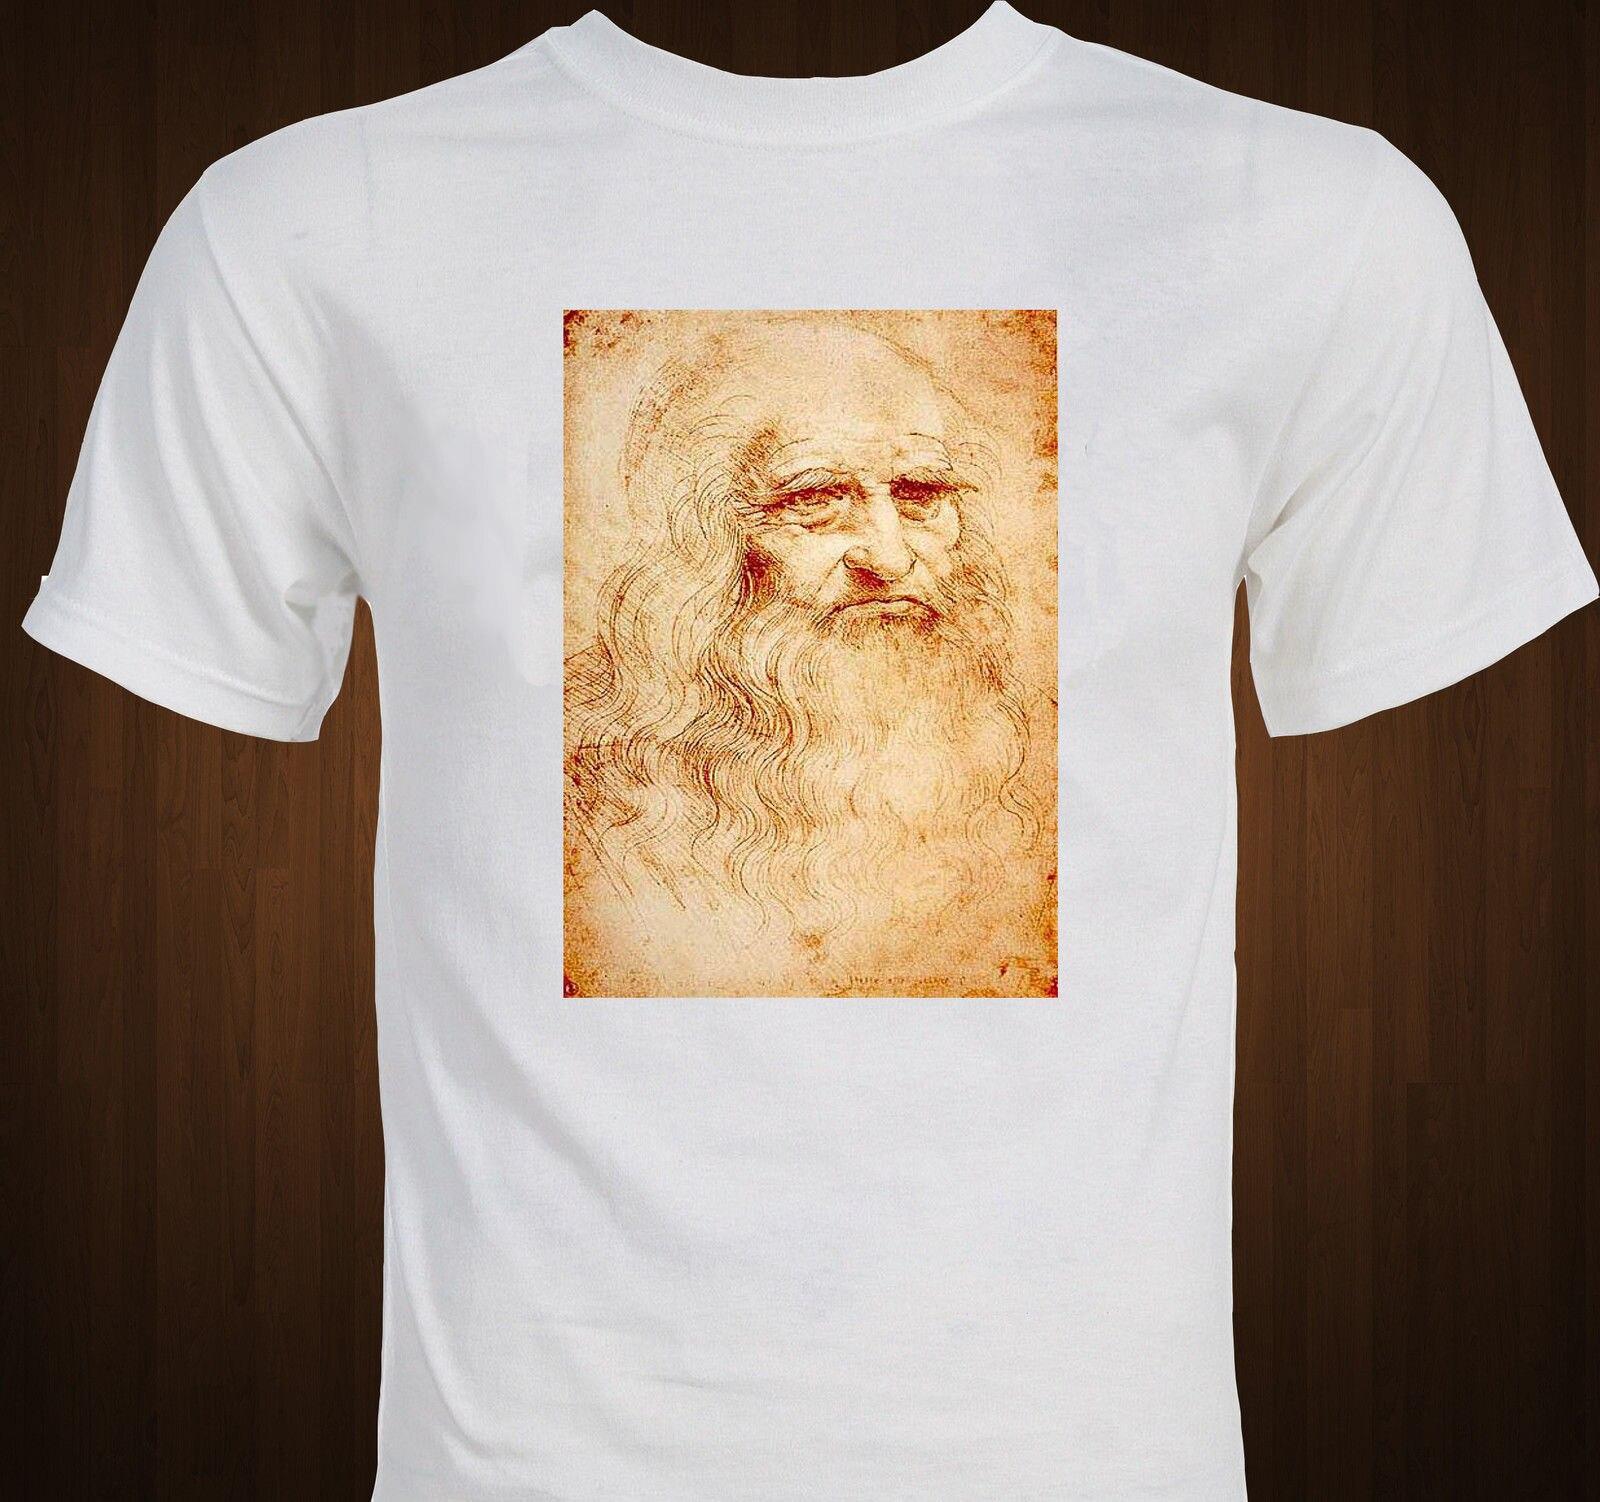 Leonardo Da Vinci autorretrato dibujo arte renacentista camiseta Cool Casual pride camiseta hombres Unisex camiseta de moda